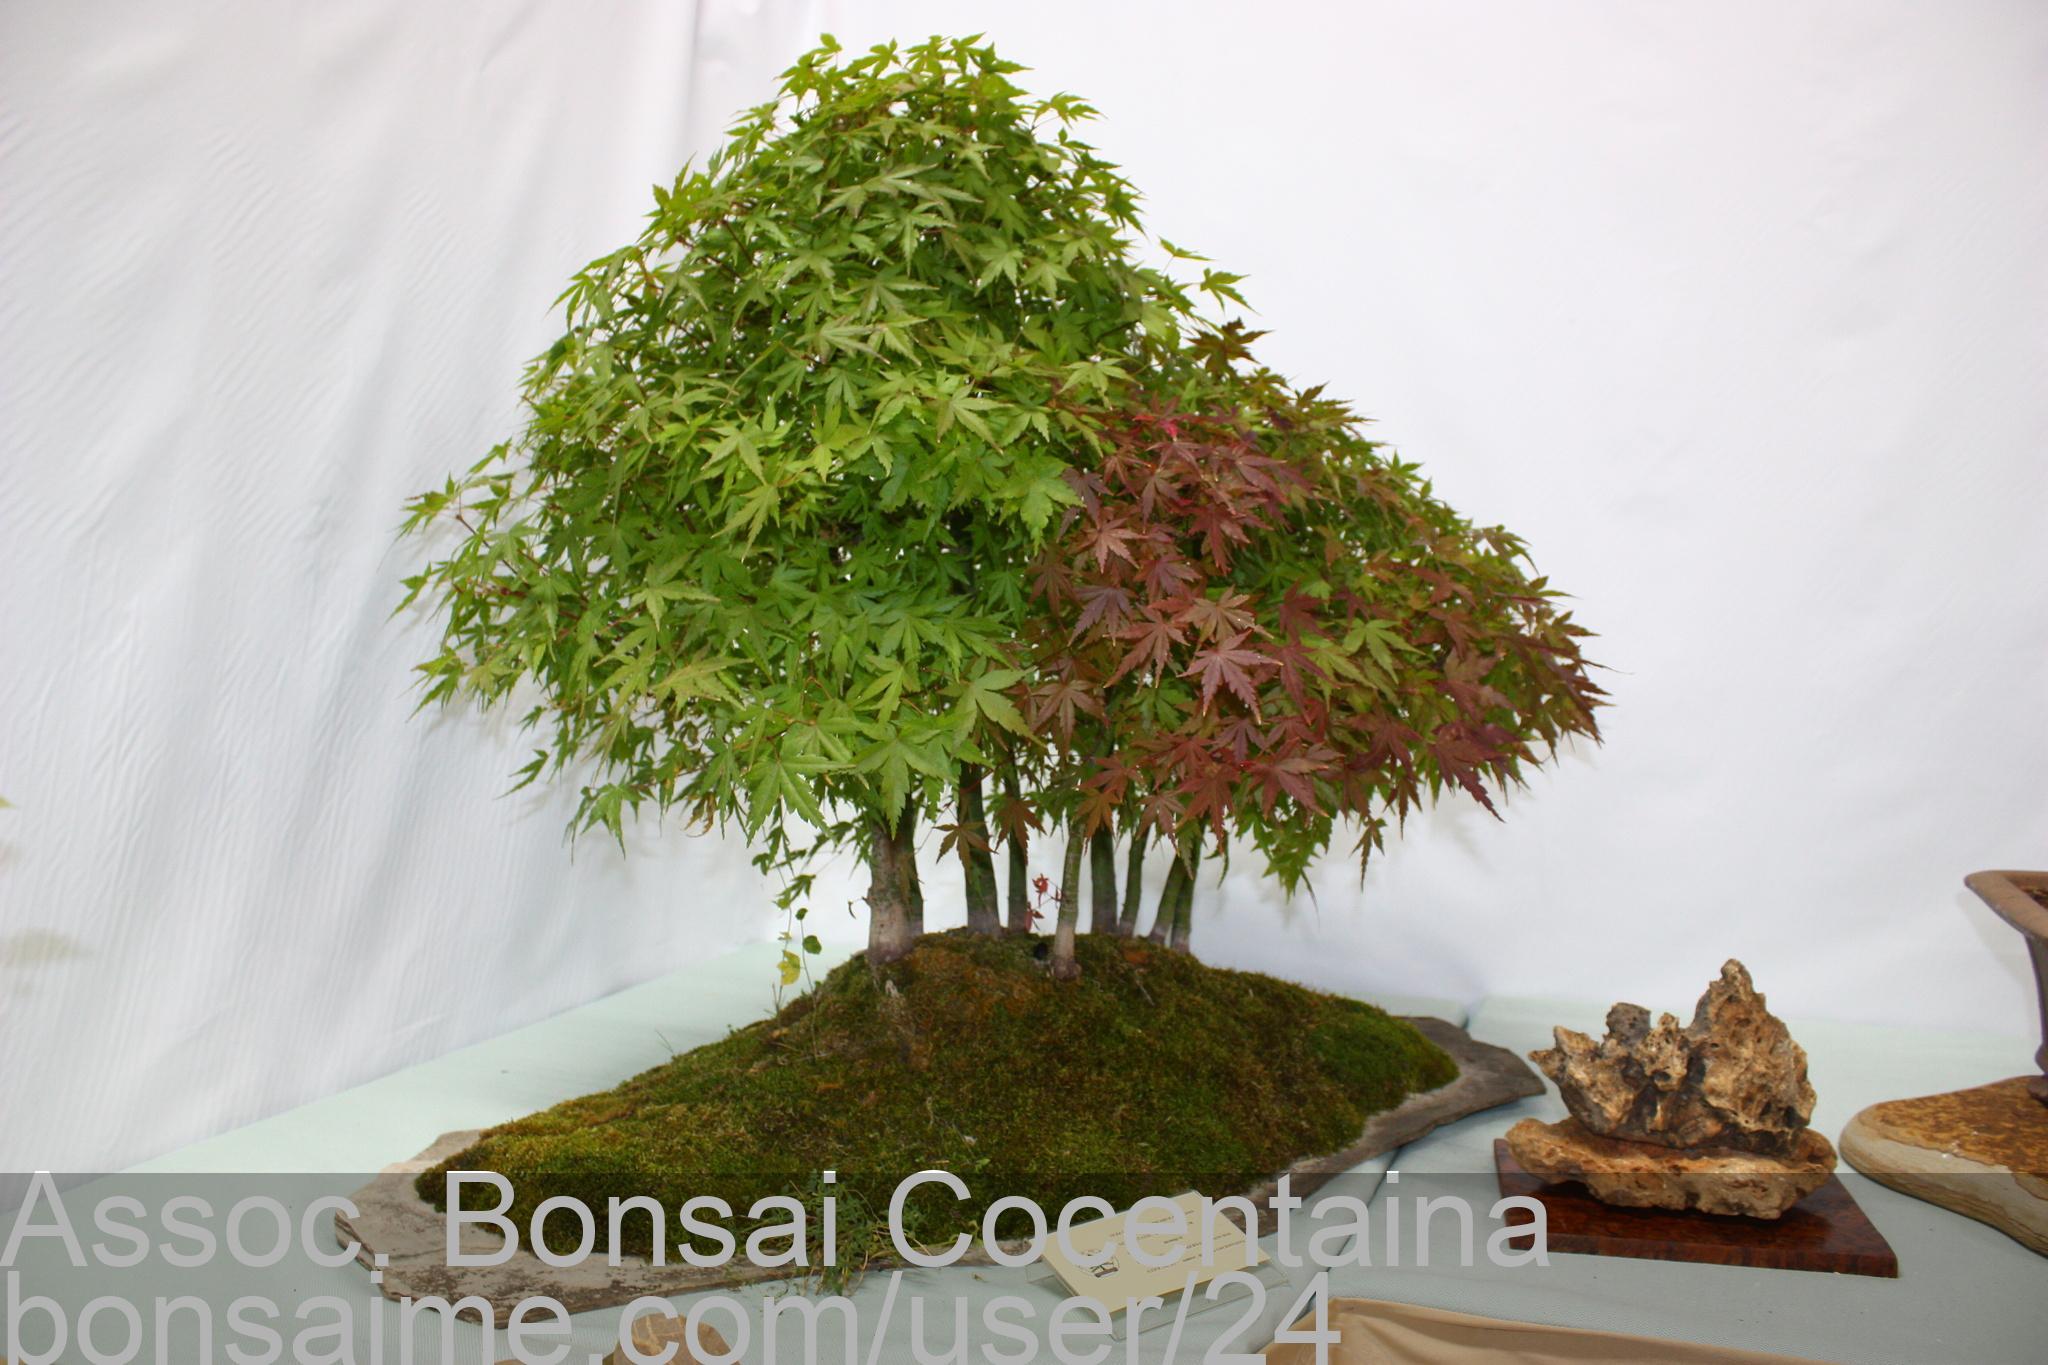 Bonsai Acer Palmatum Bosque Assoc Bonsai Cocentaina